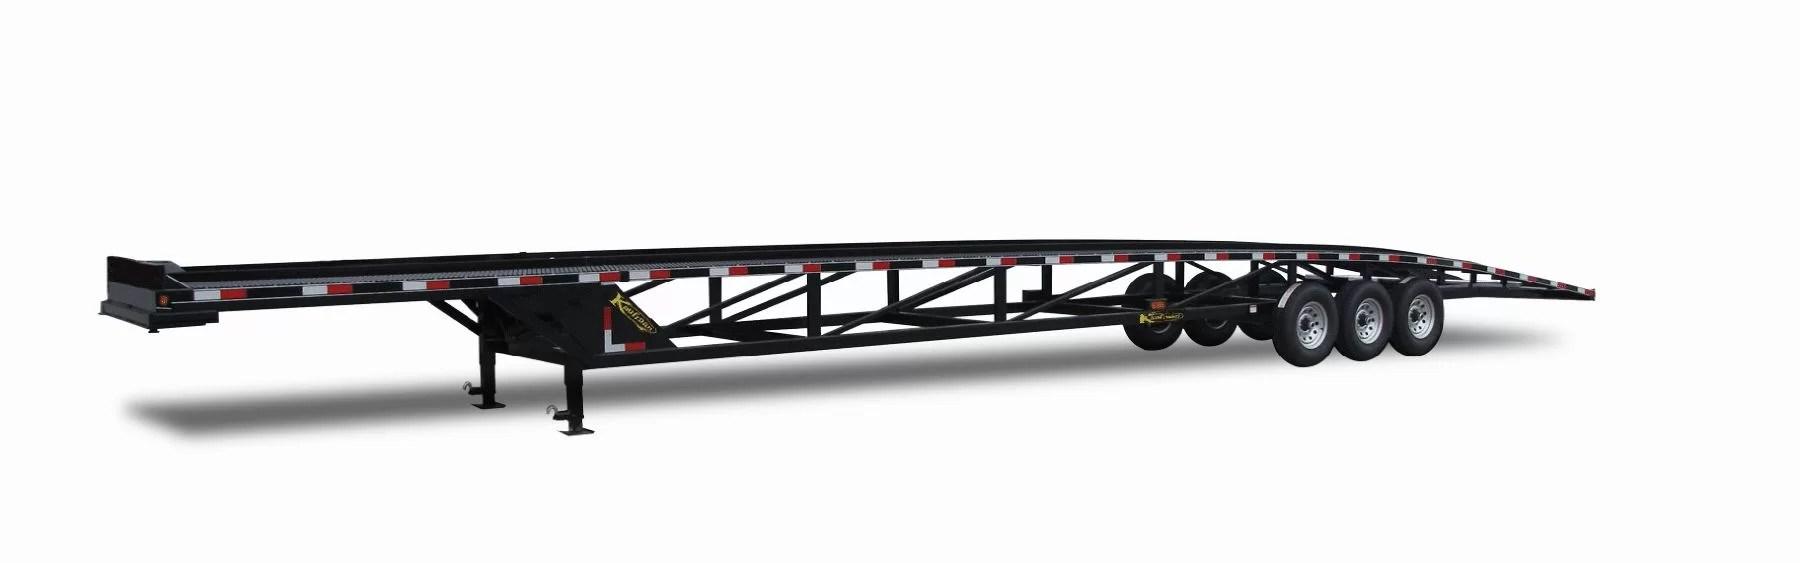 hight resolution of kaufman gooseneck trailer wiring diagram car wedge trailers kaufman trailersrh kaufmantrailers com